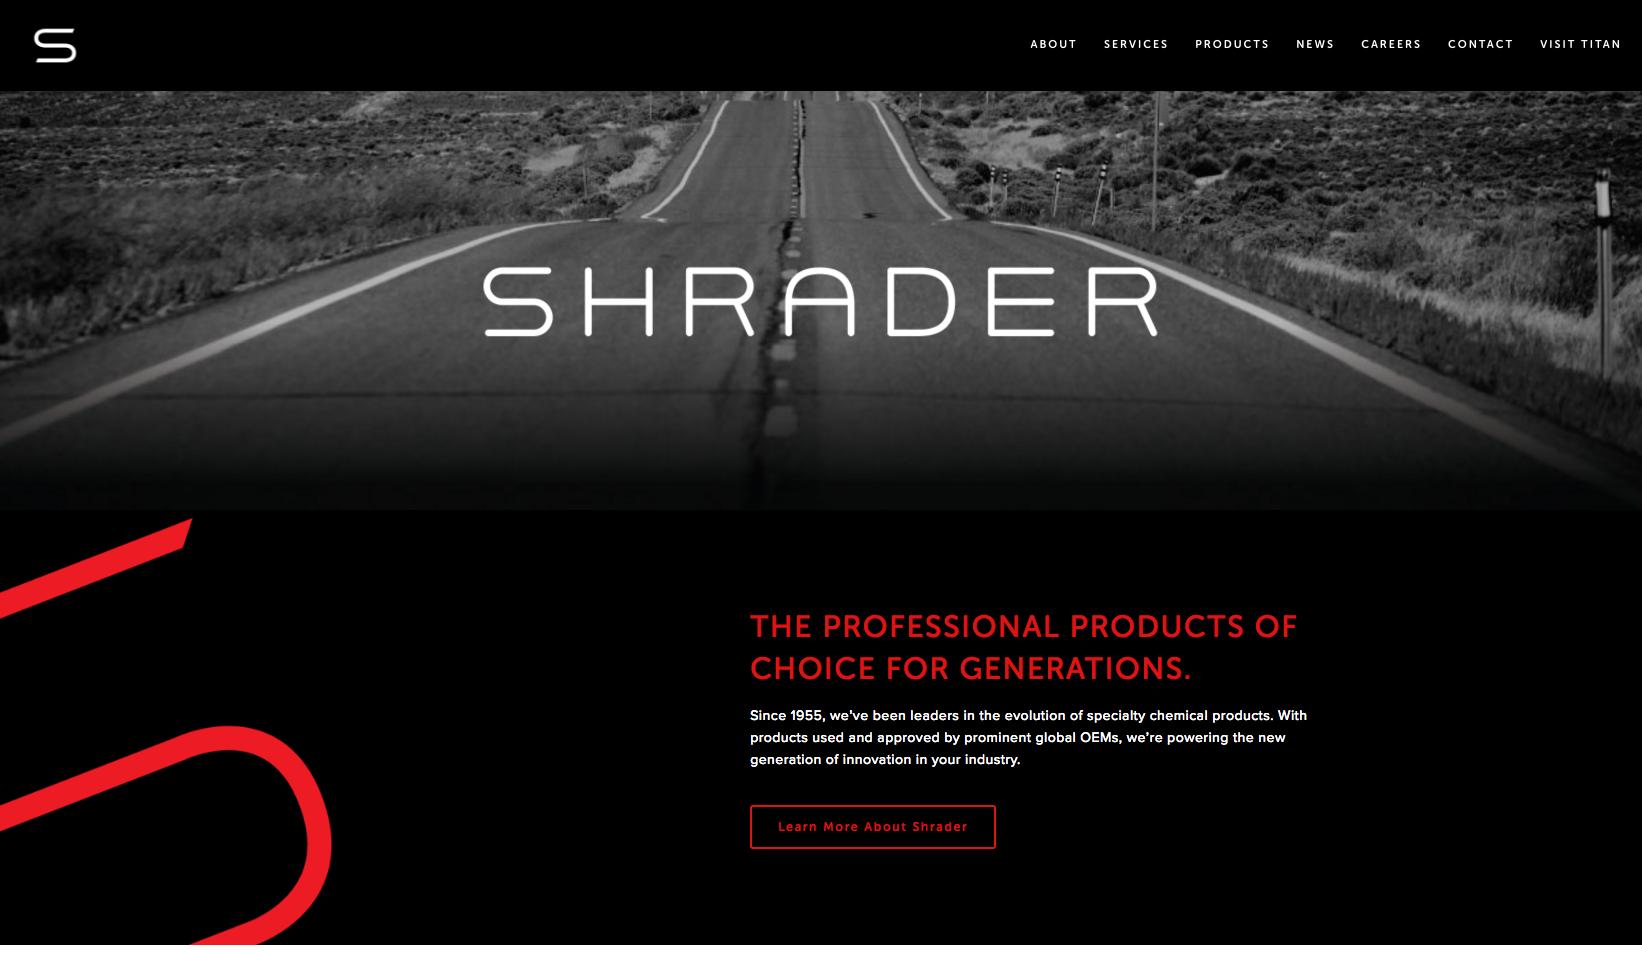 fireshot-capture-3-shrader-canada-ltd-http___www.shradercanada.com_